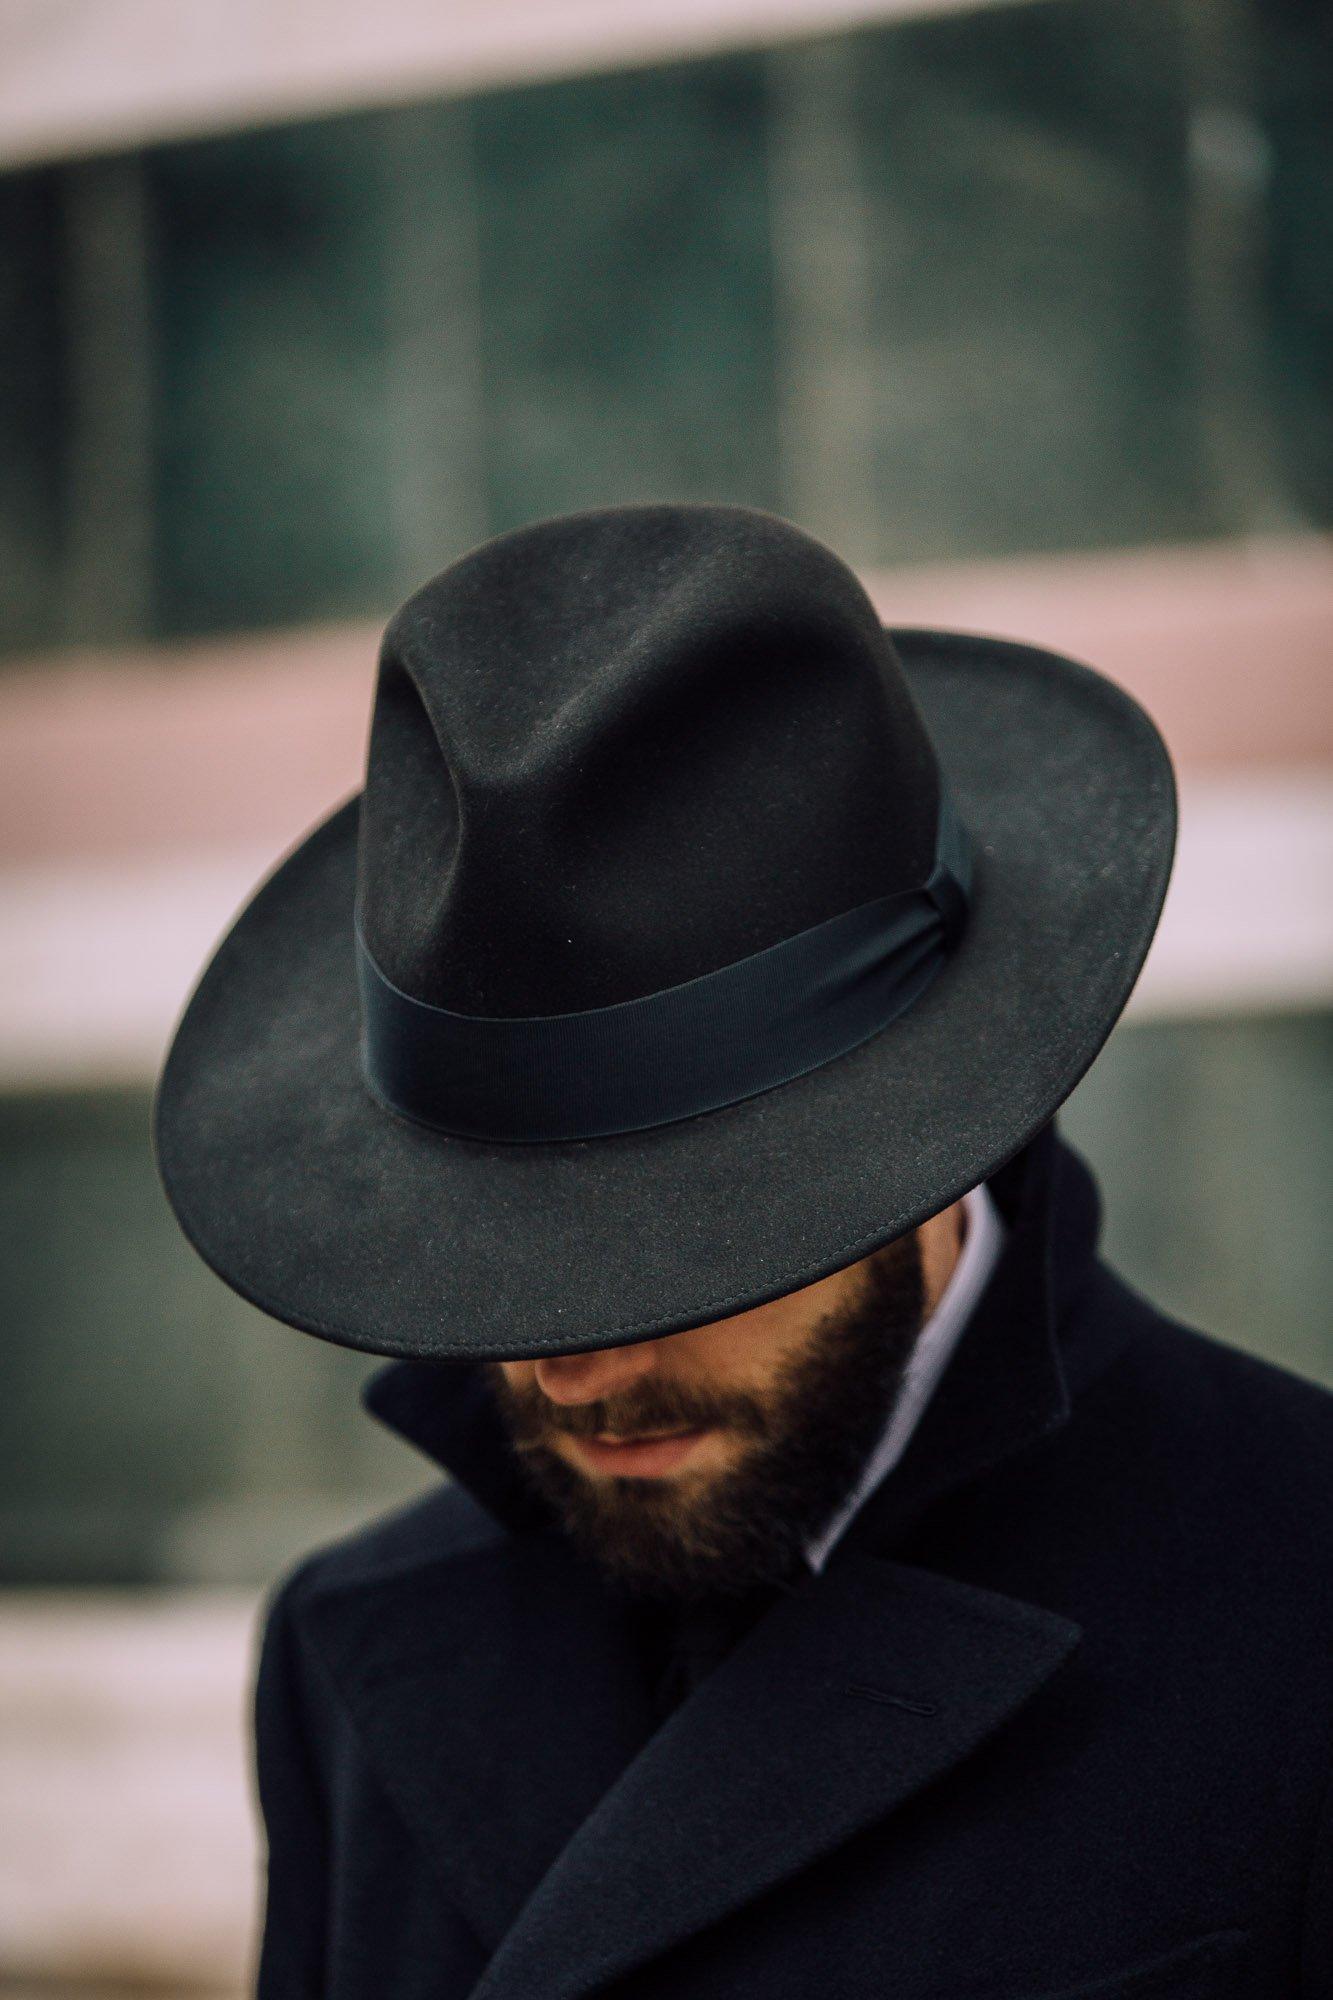 c3669a1c308 Optimo bespoke felt hat  Review – Permanent Style